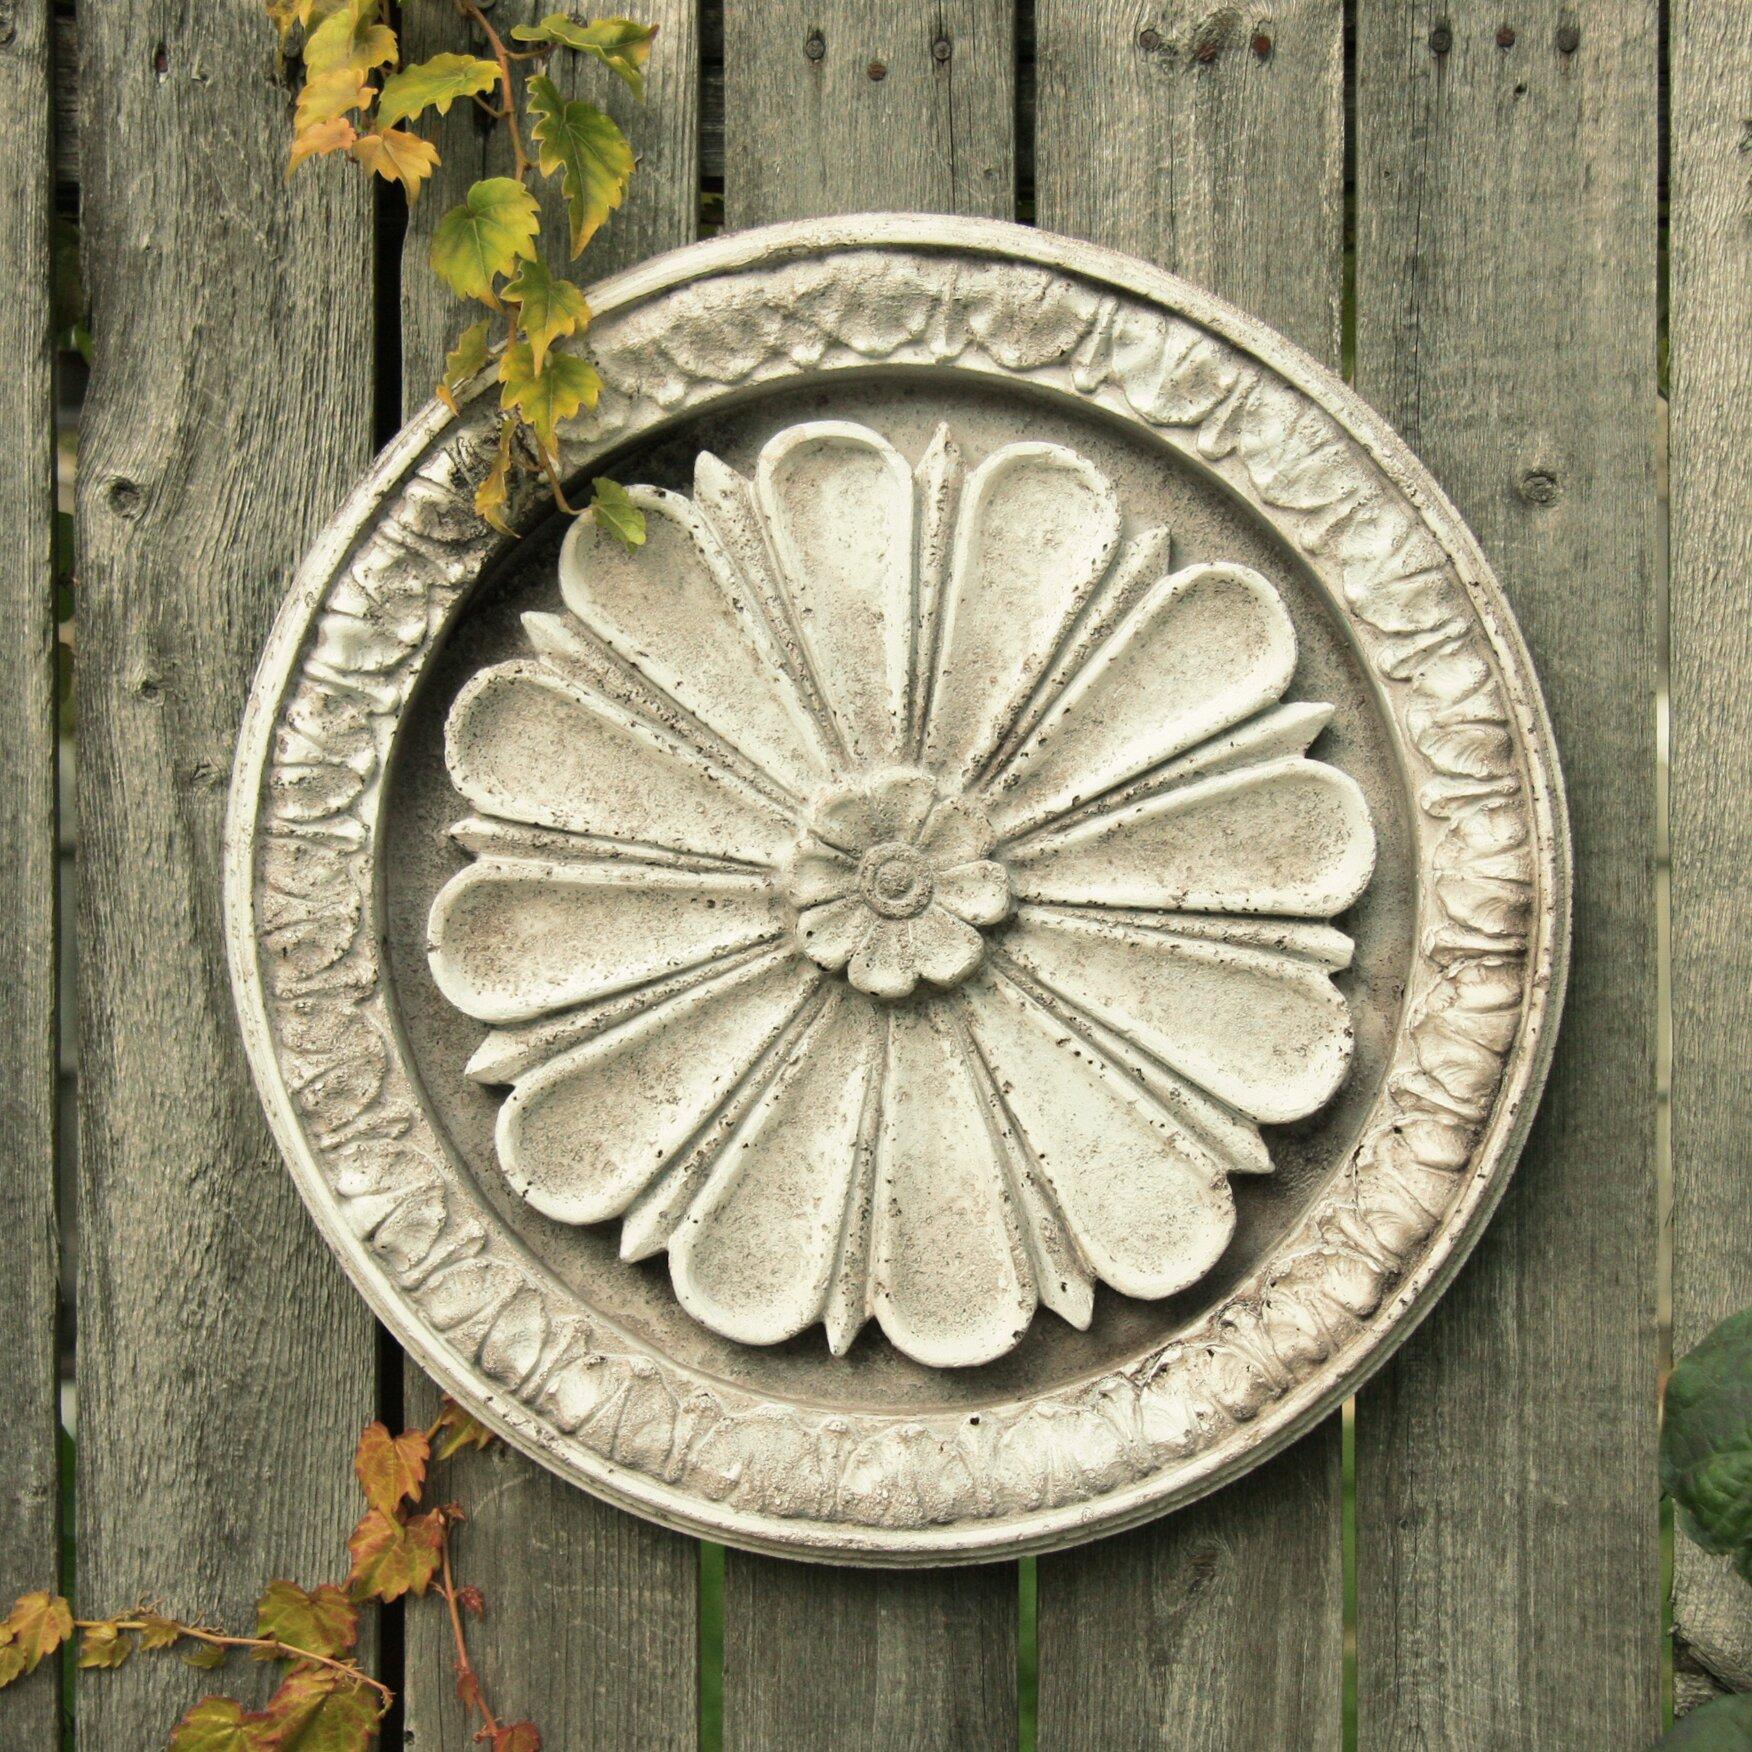 OrlandiStatuary Abbott Medallion Wall Decor & Reviews